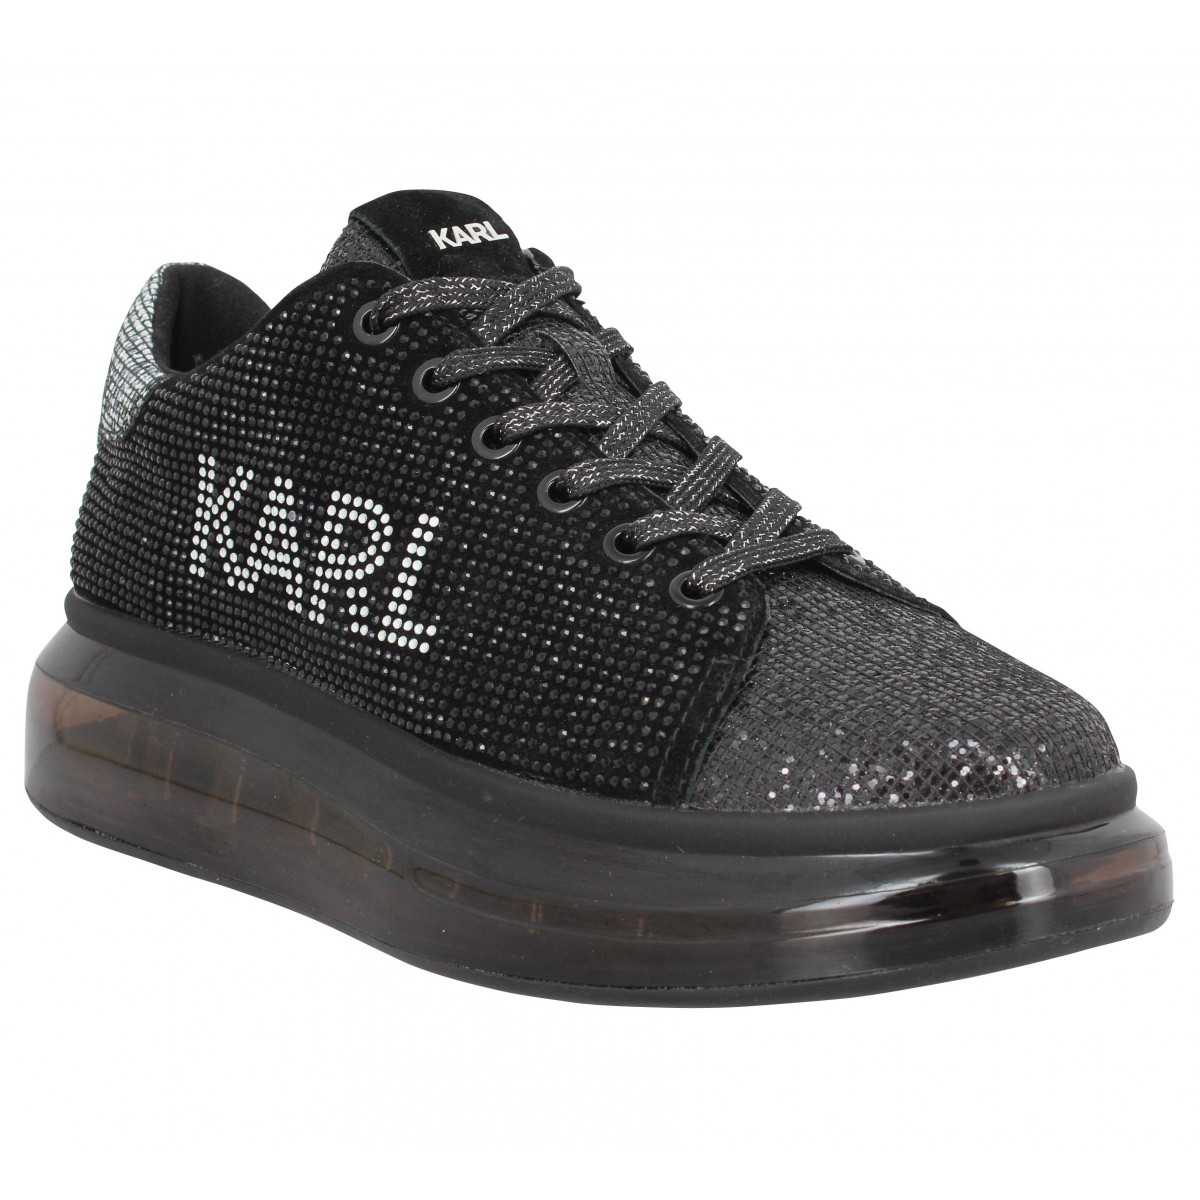 Karl Lagerfeld Marque Kapri Kushion Karl...